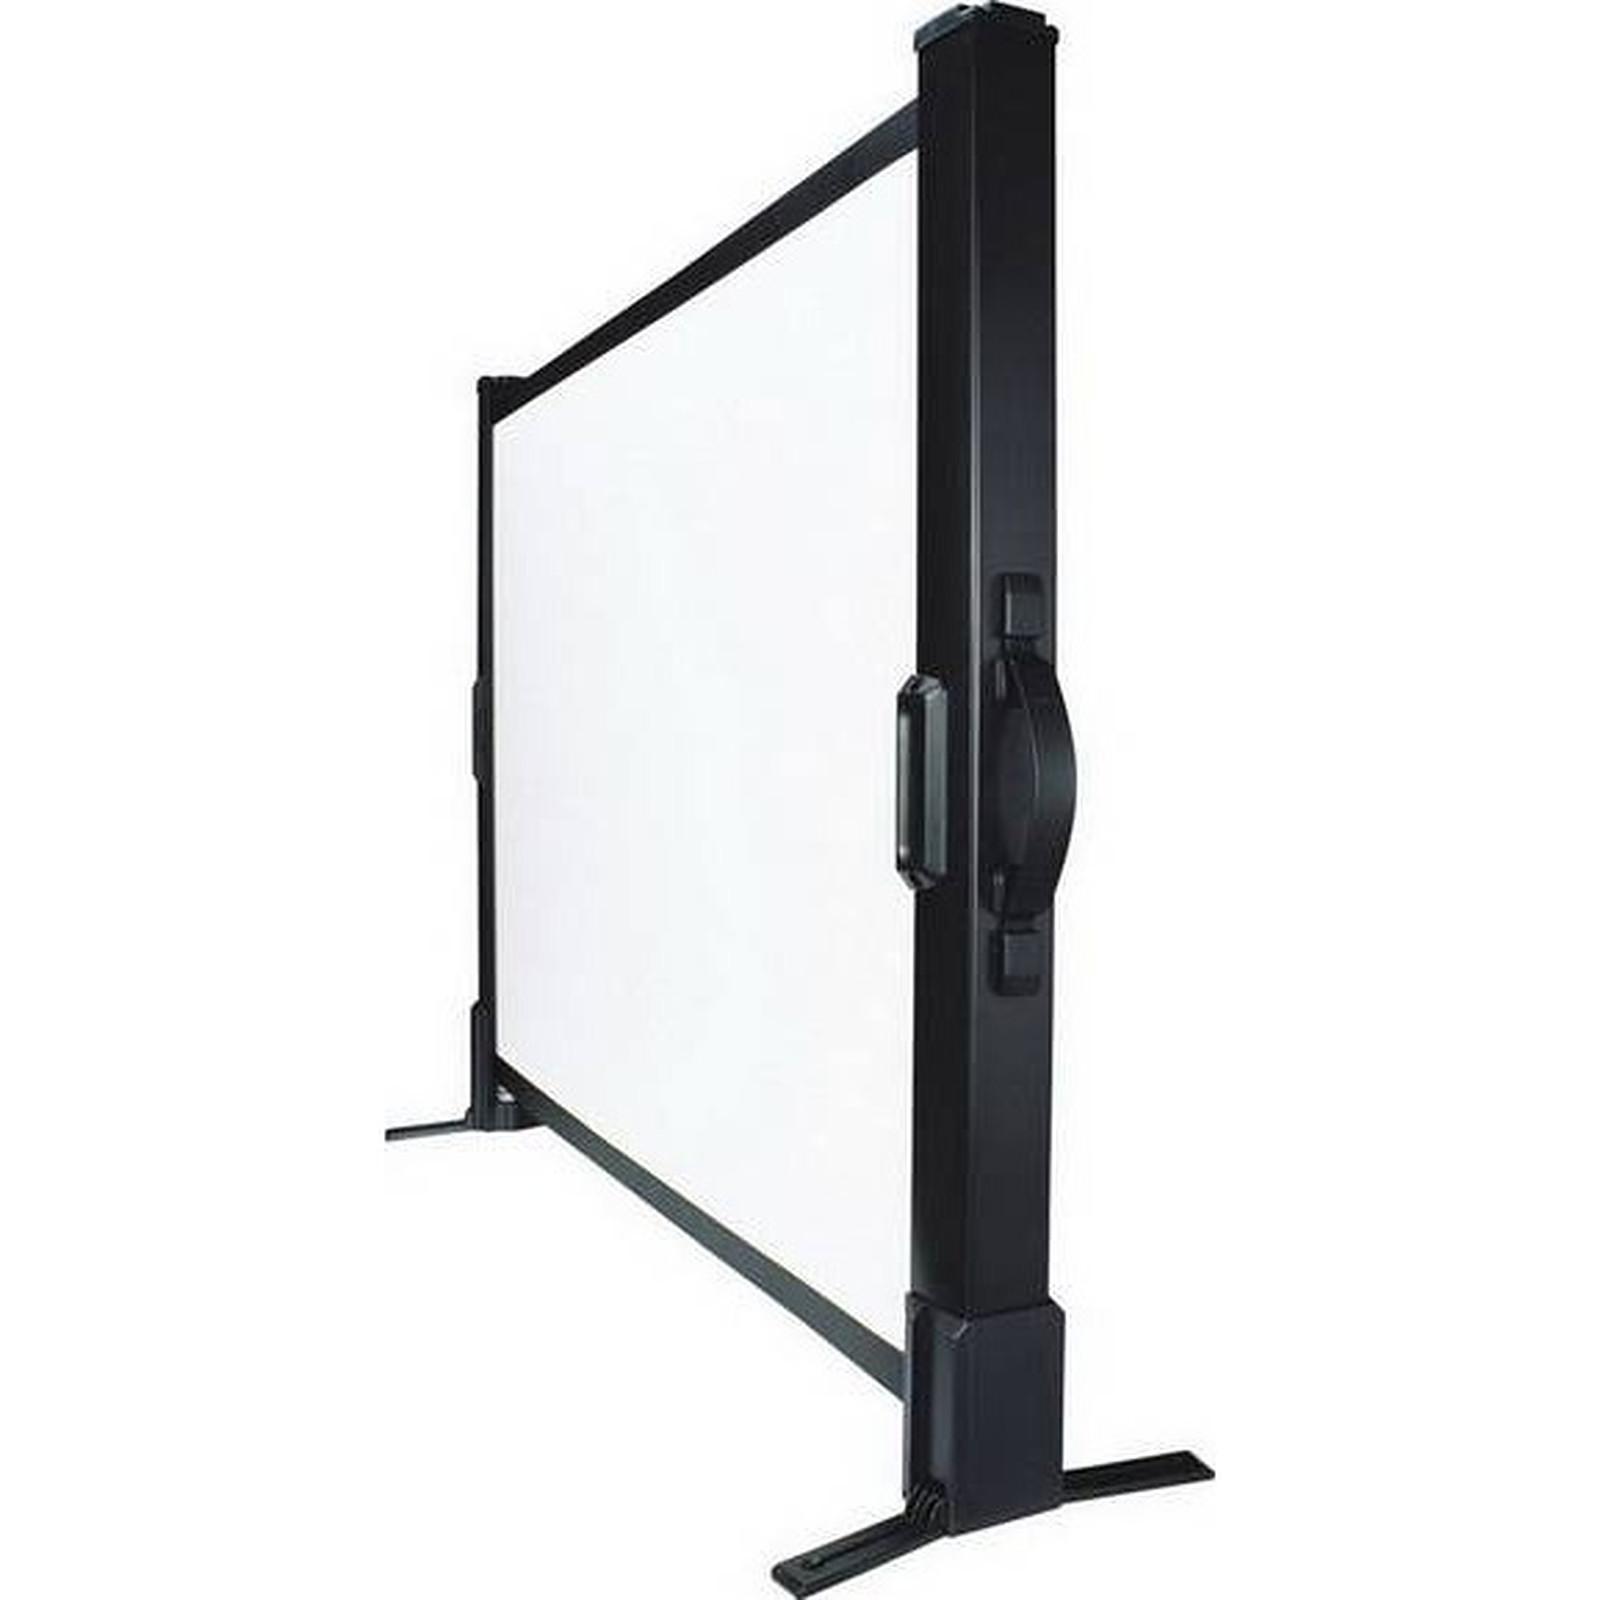 LDLC Ecran de table - Format 4:3 - 102 x 76 cm